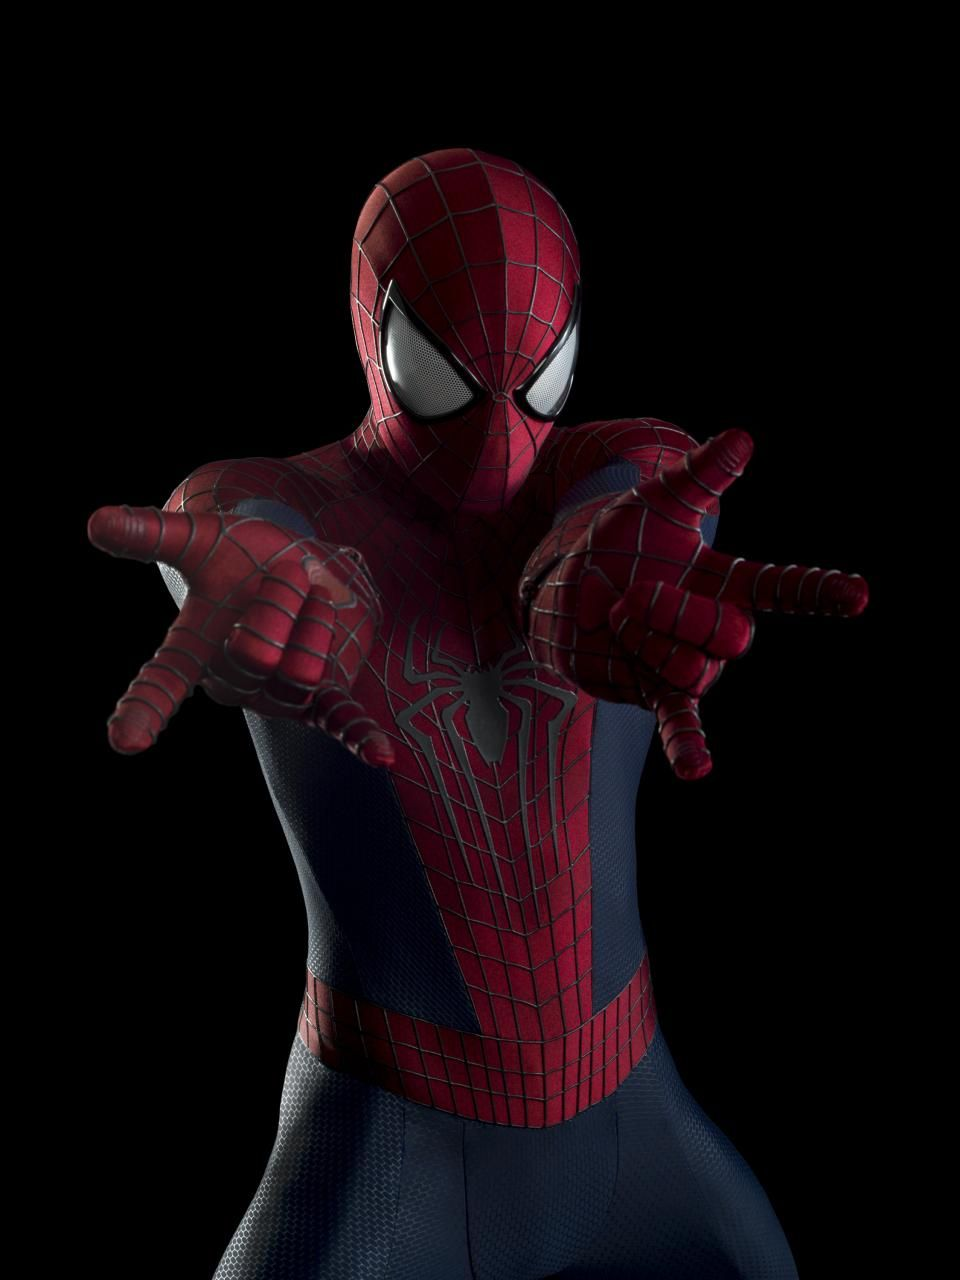 the amazing spiderman 2 title the amazing spiderman 2